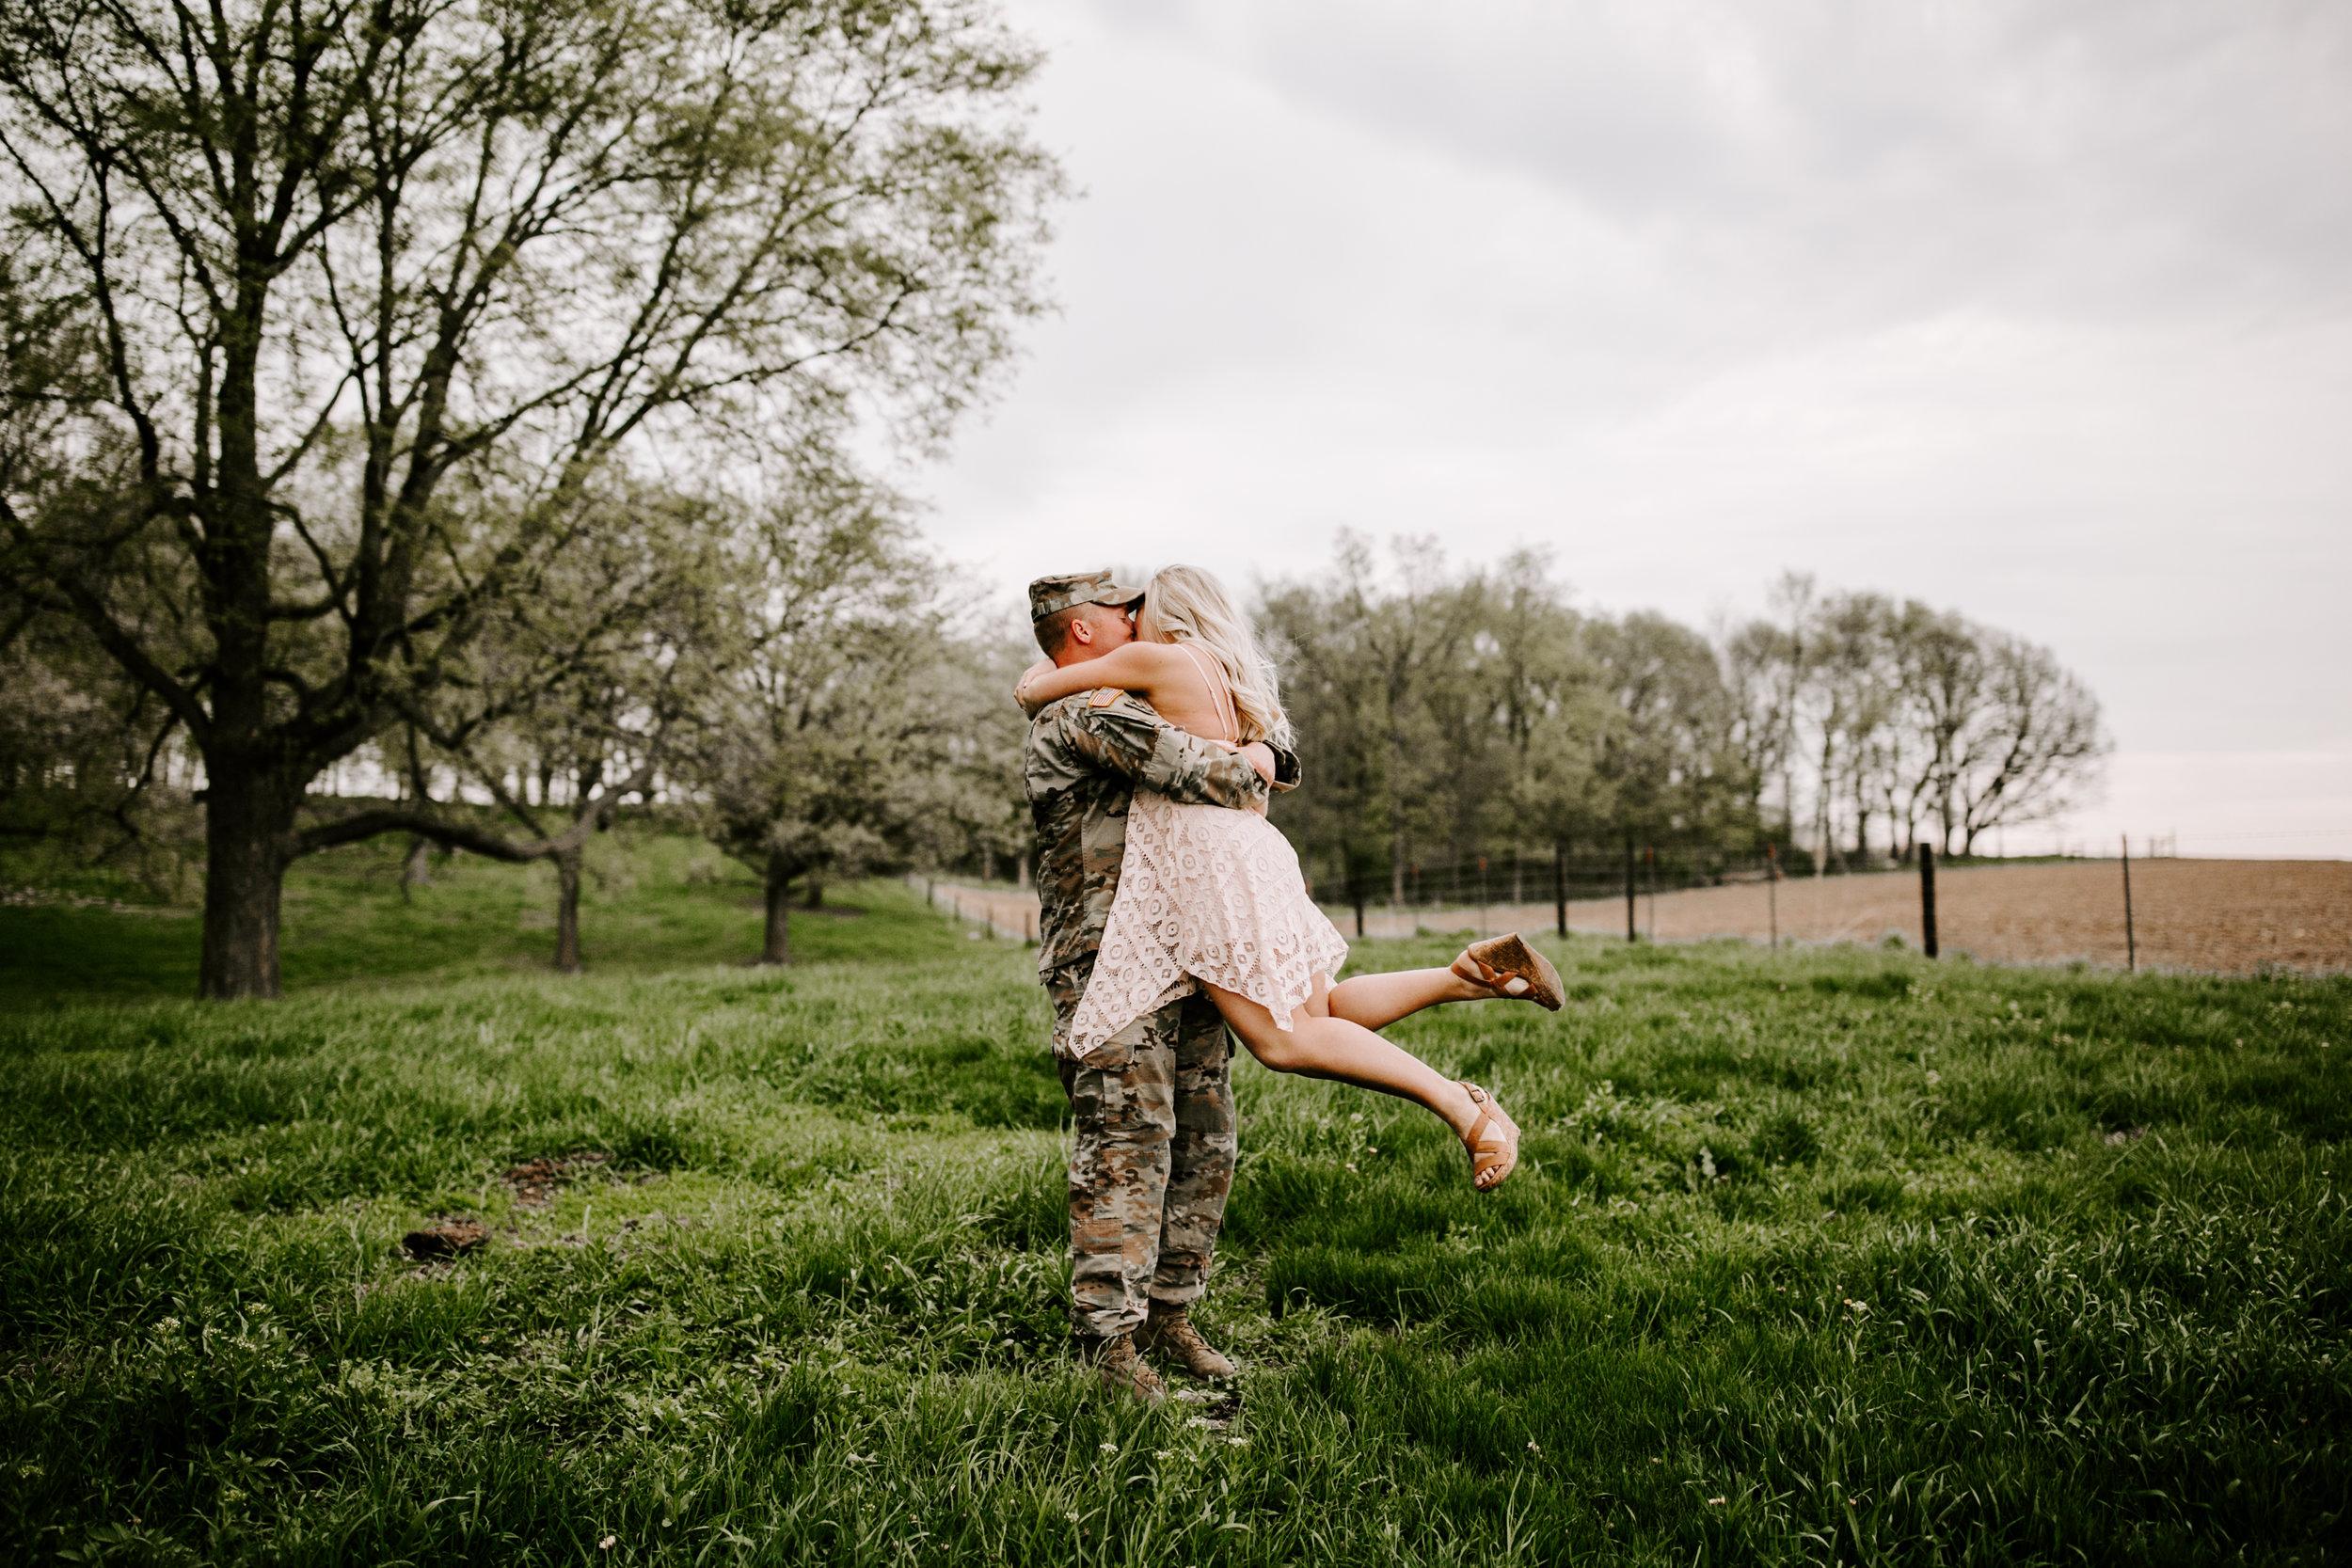 gracetphotography-wedding-photographer-adventure-bride-engagement-28.jpg